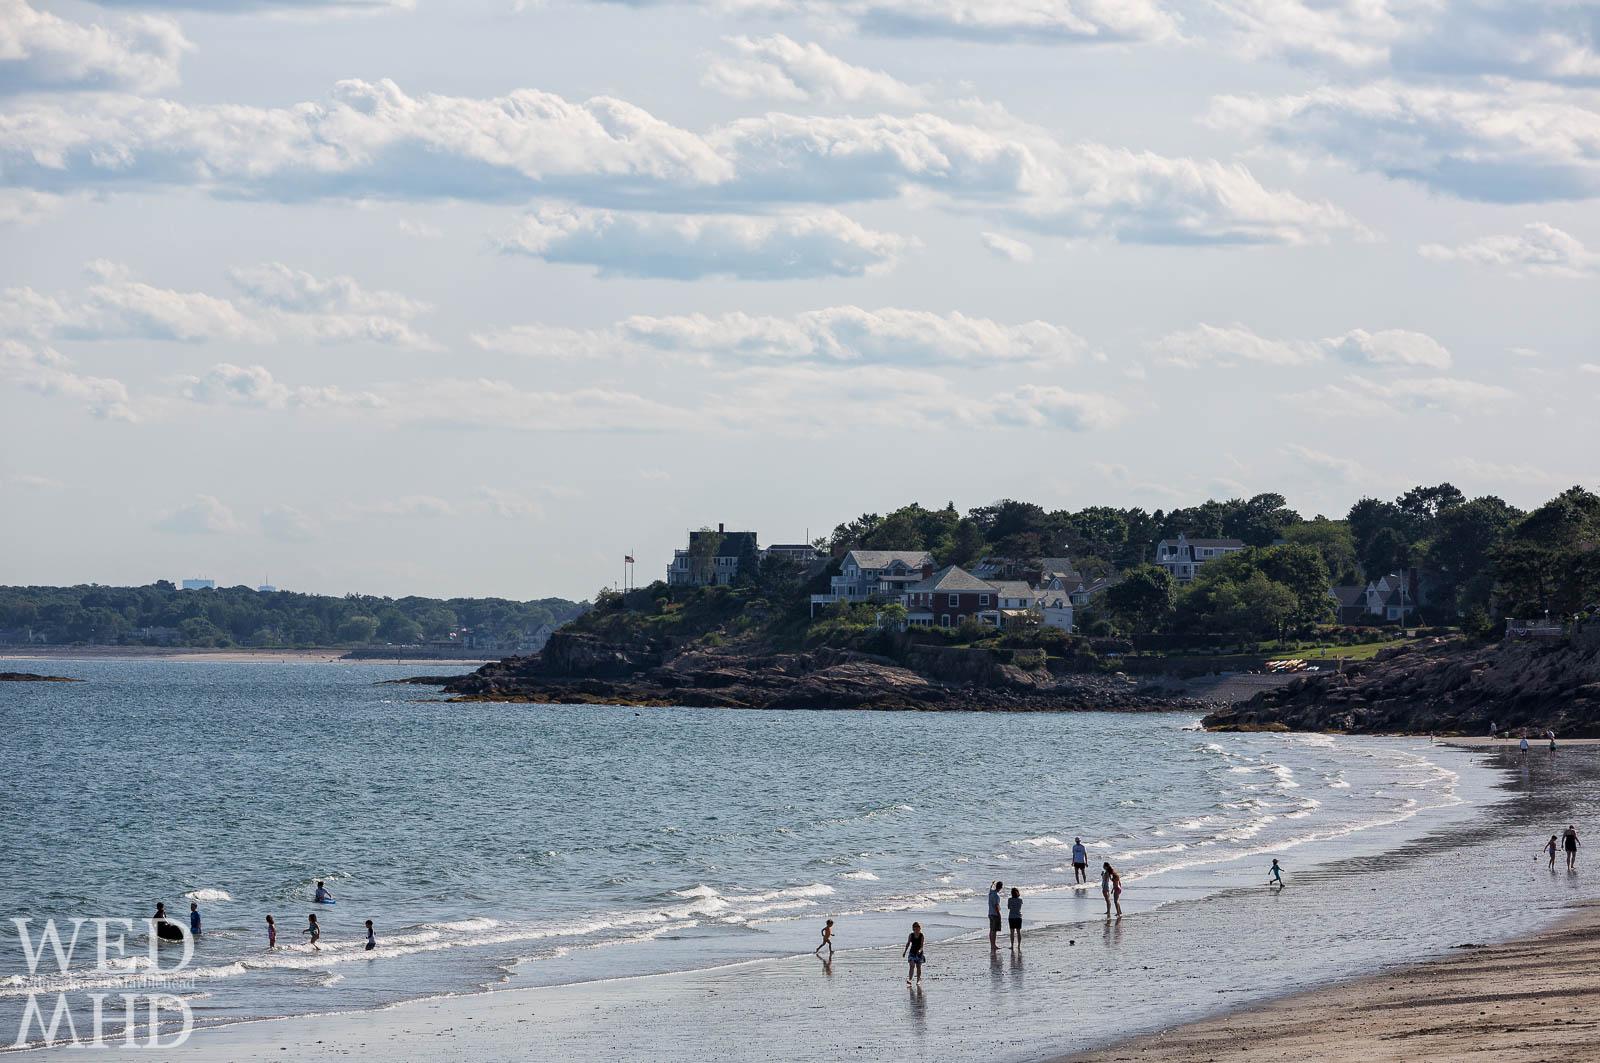 Devereux Beach Silhouettes